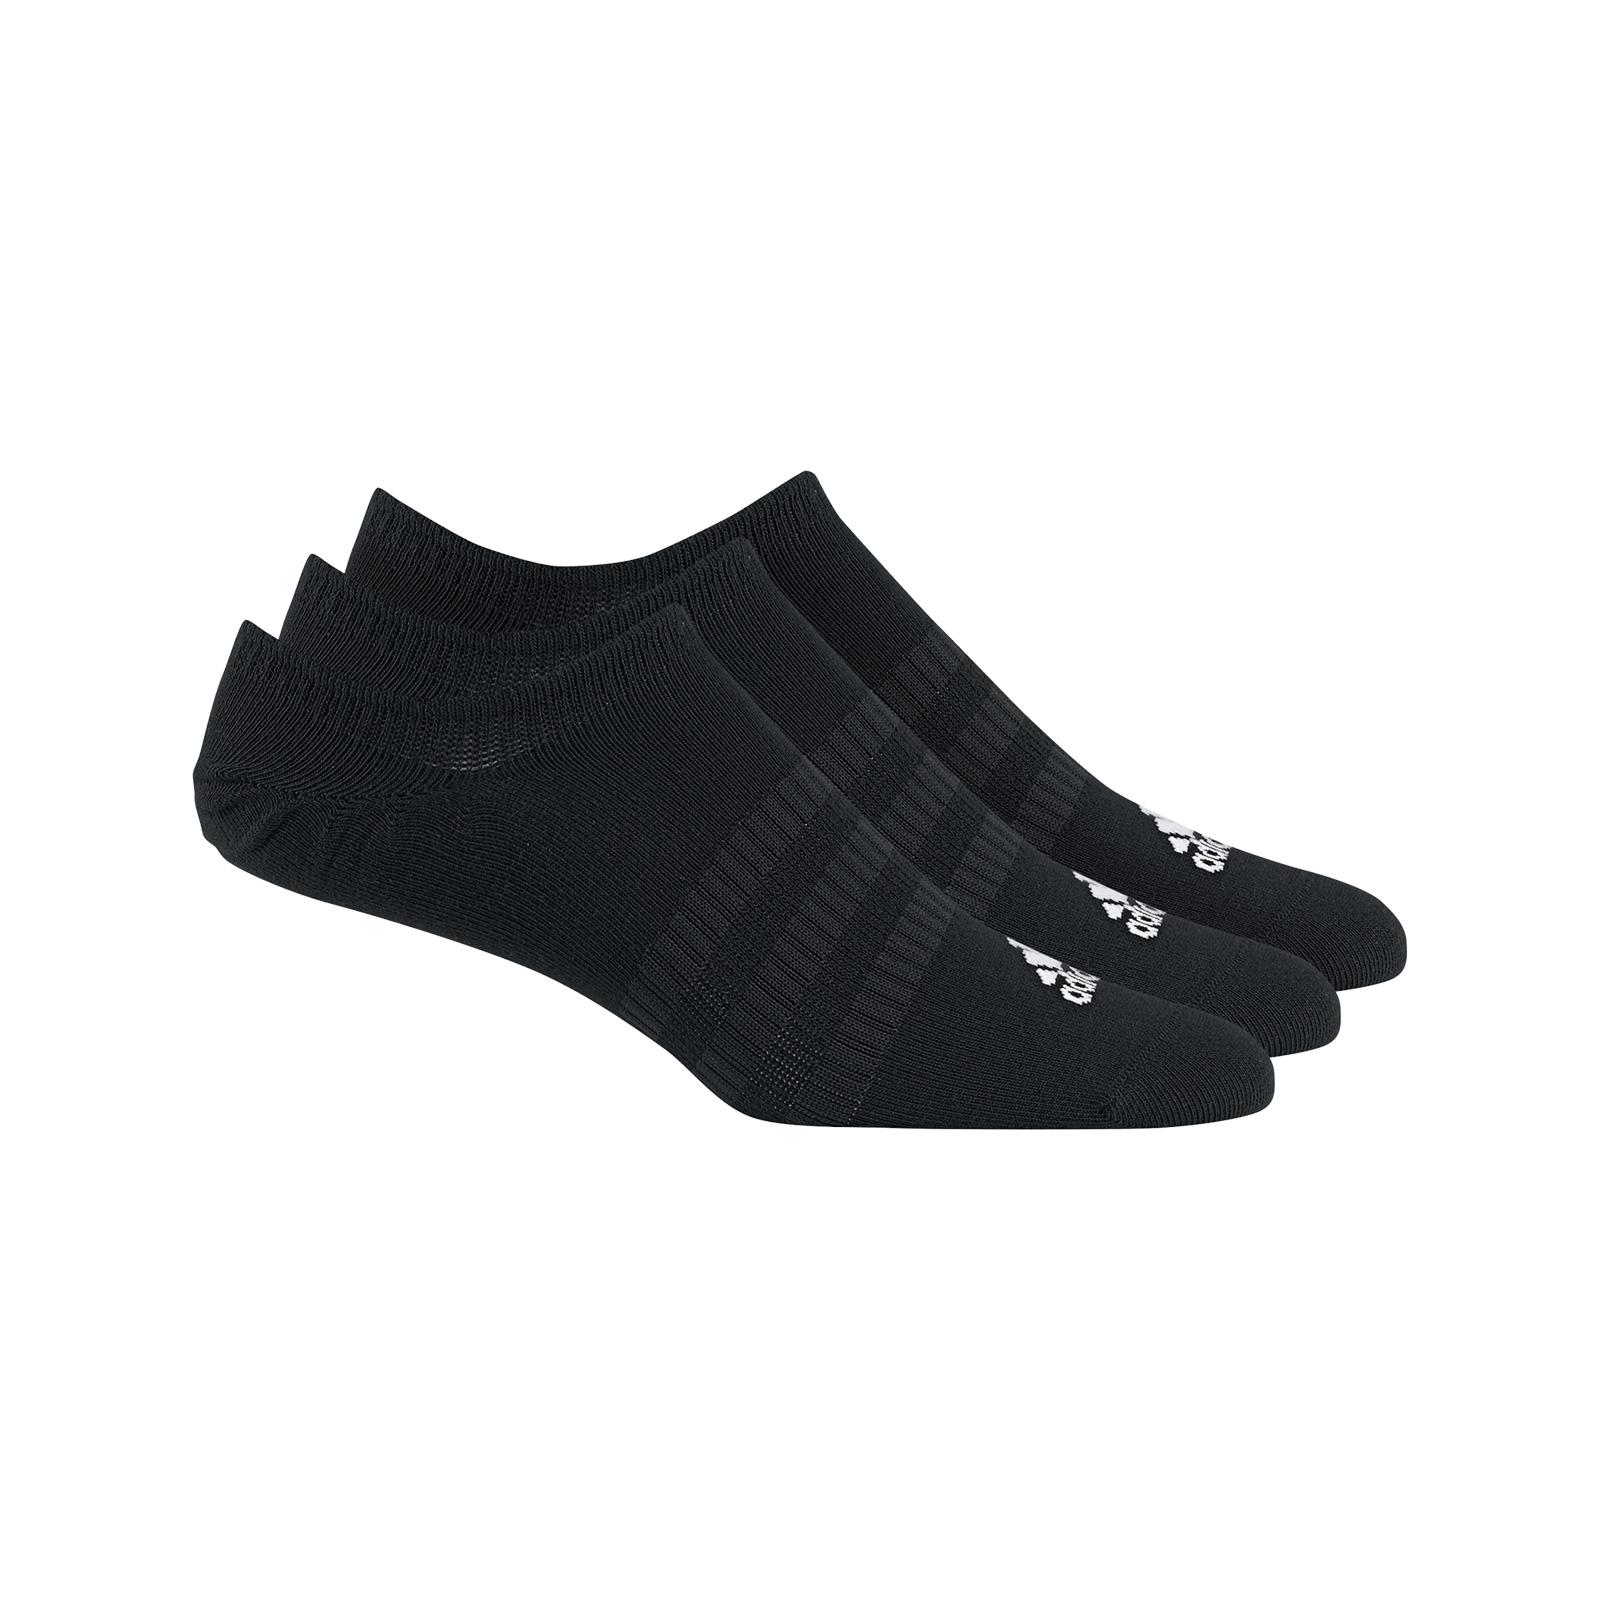 adidas - LIGHT NOSH 3PP - BLACK/BLACK/BLACK